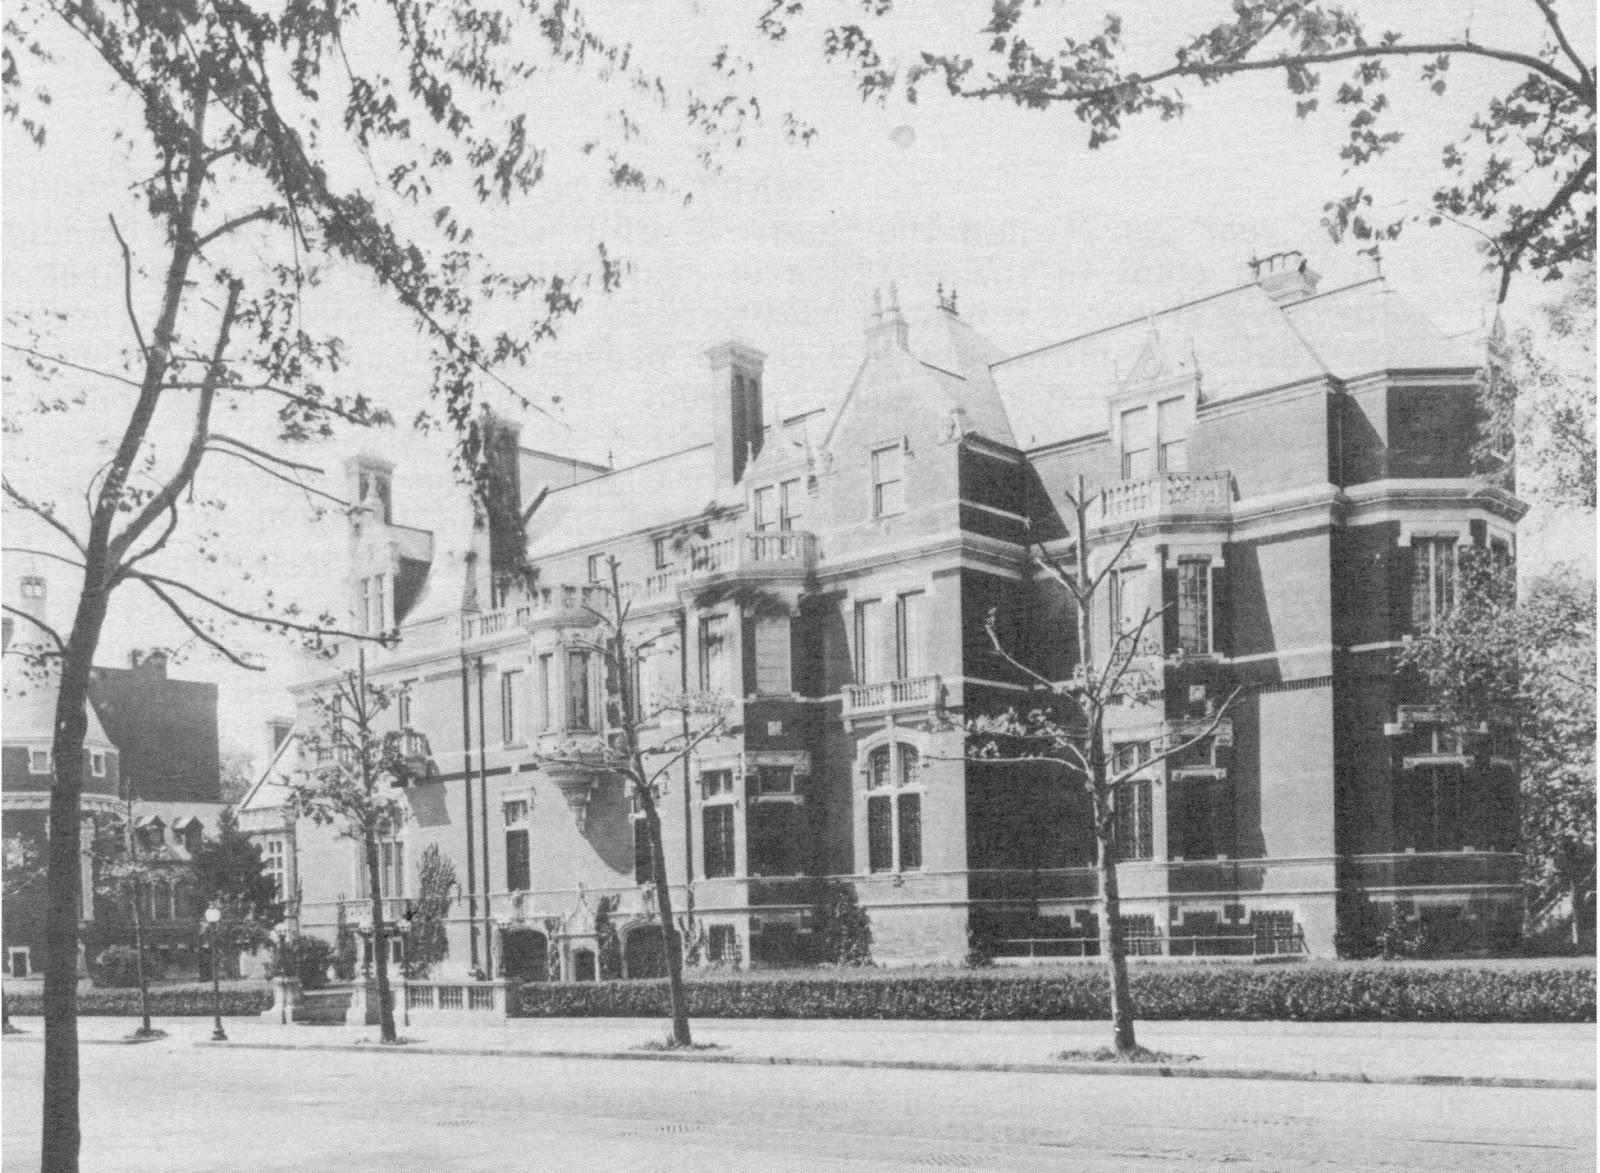 The House History Man Washington DC Ties To The 1960s